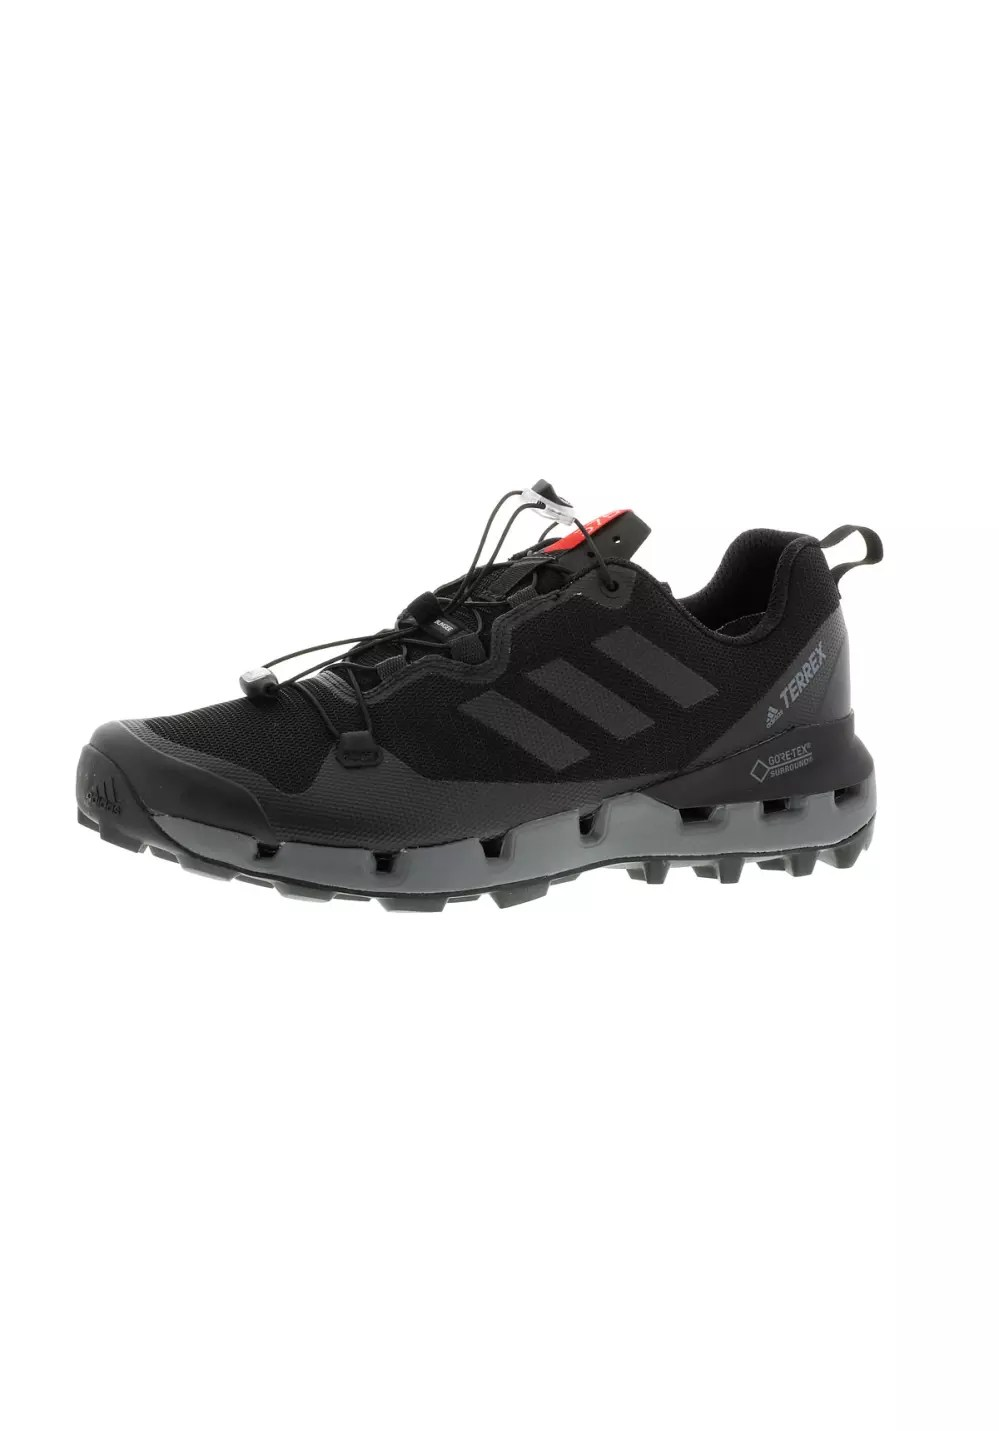 Adidas Terrex Fast 3